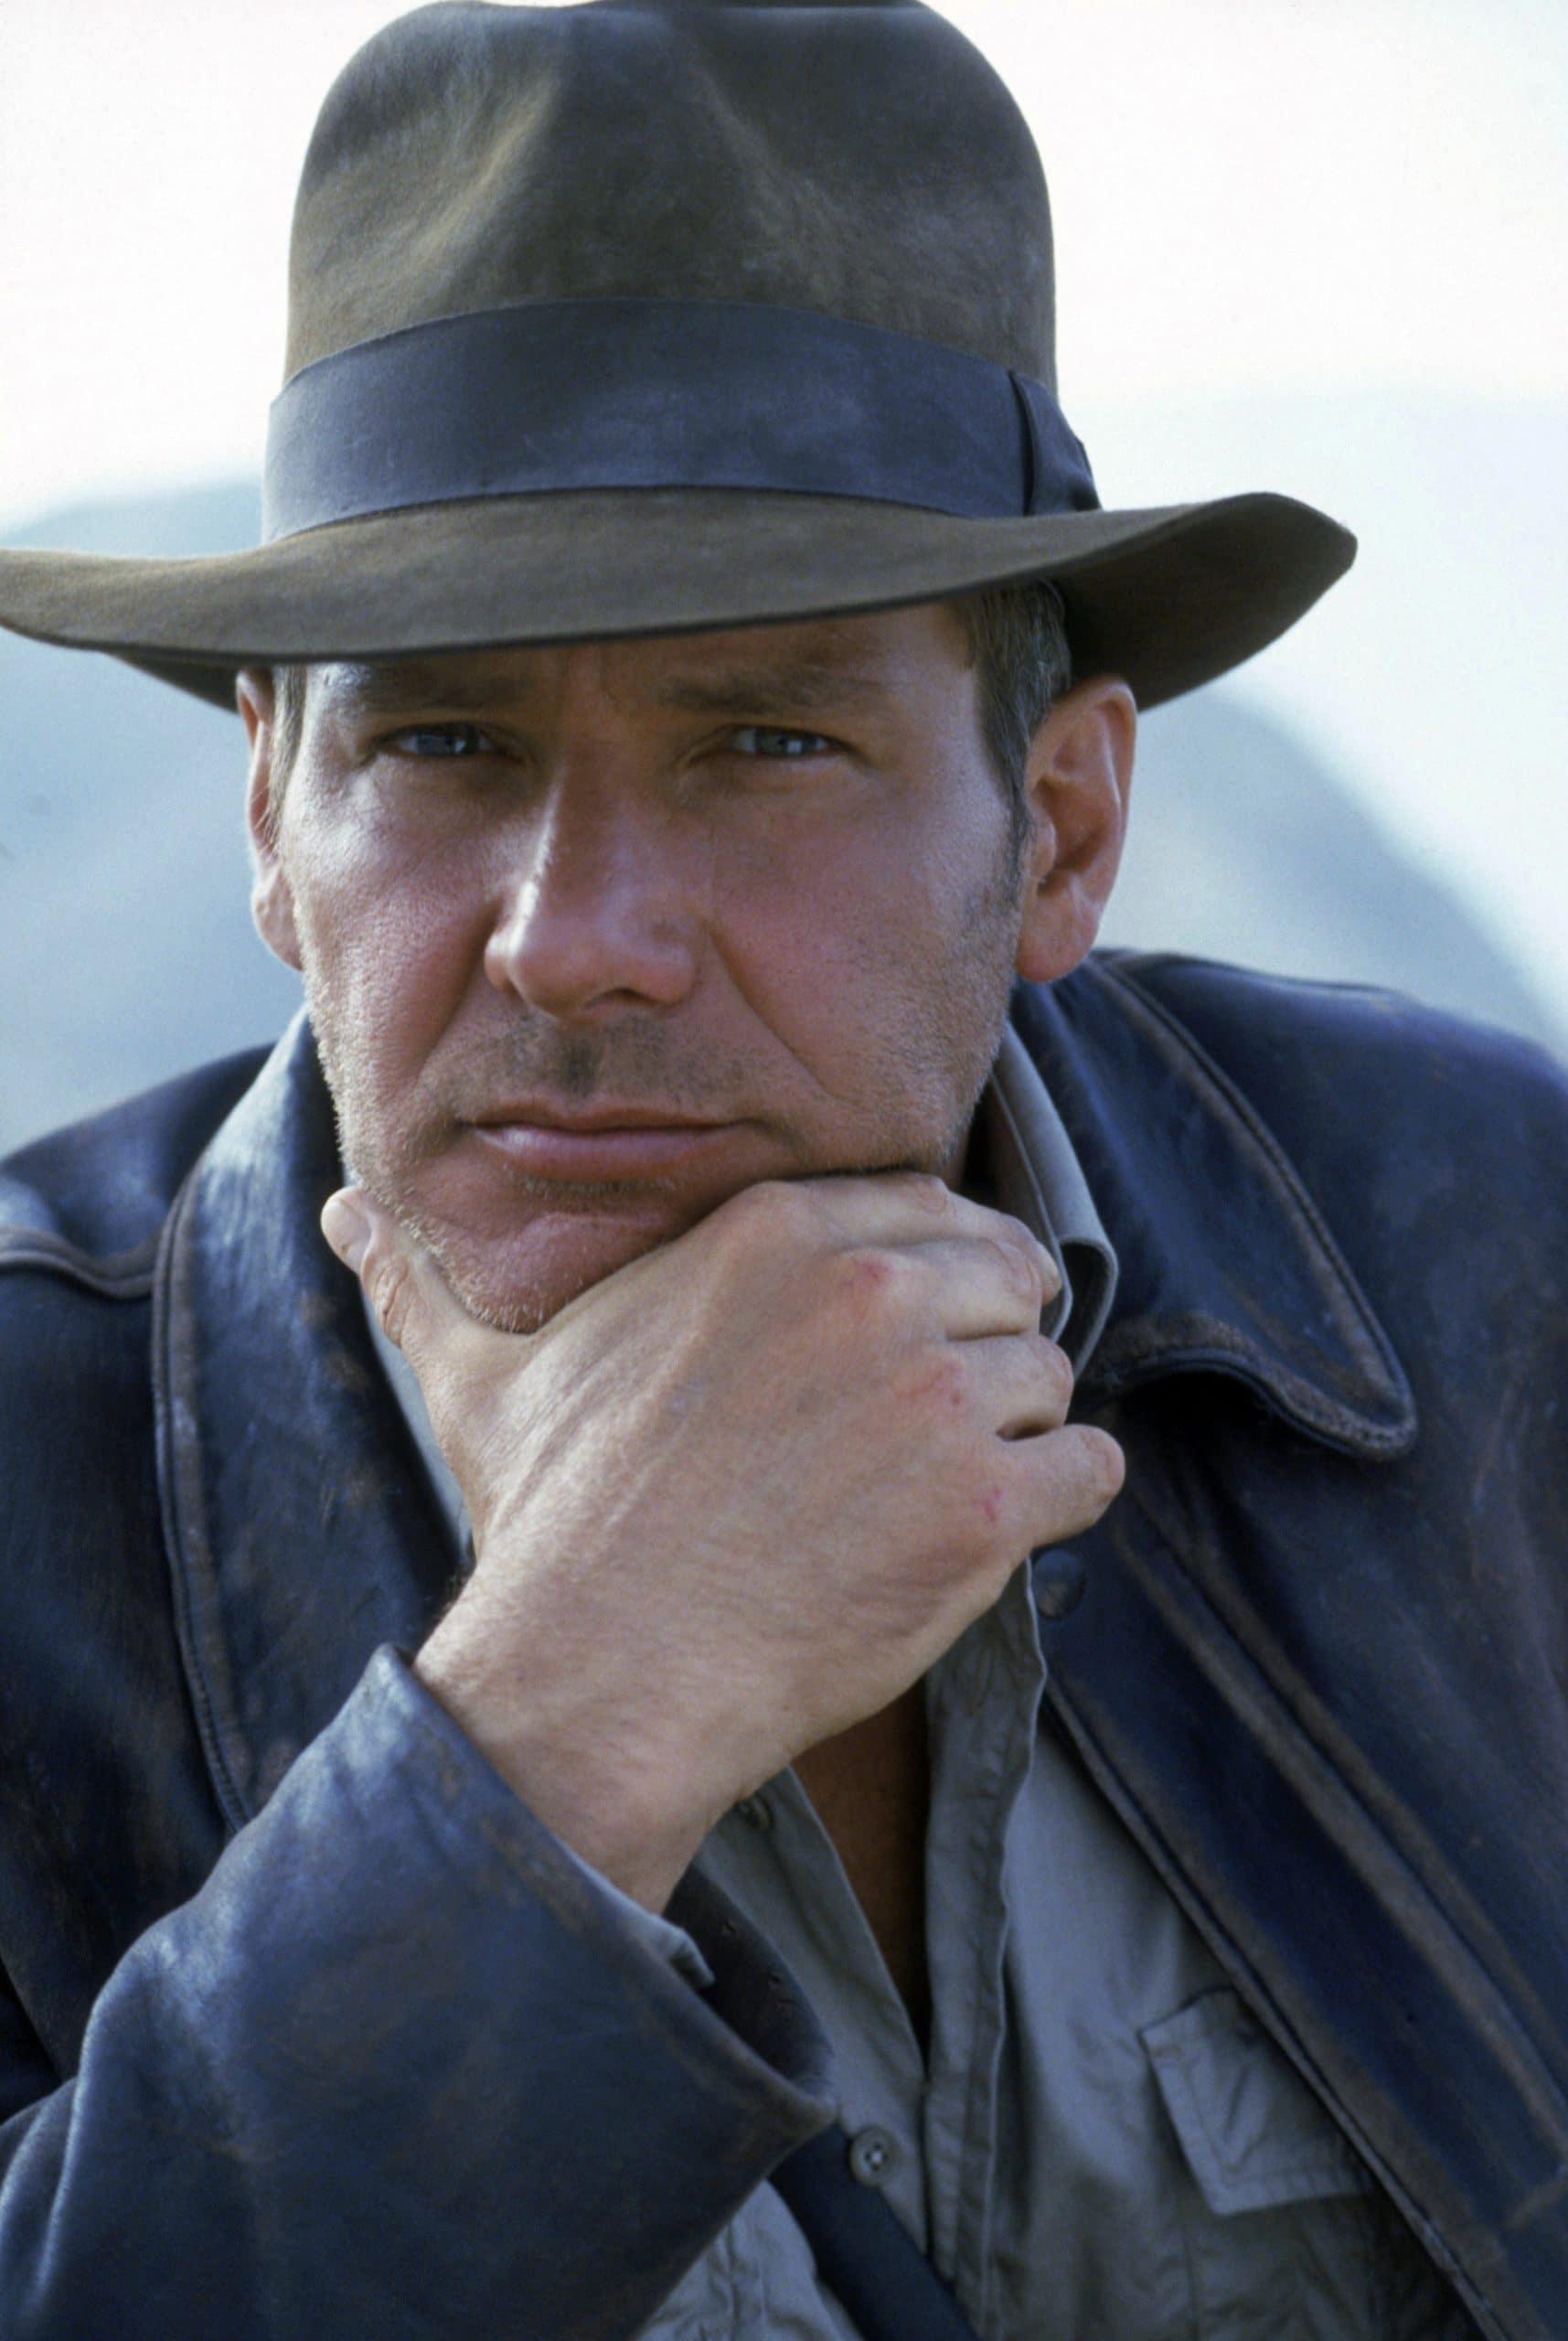 INDIANA JONES AND THE LAST CRUSADE, Harrison Ford as Indiana Jones, 1989